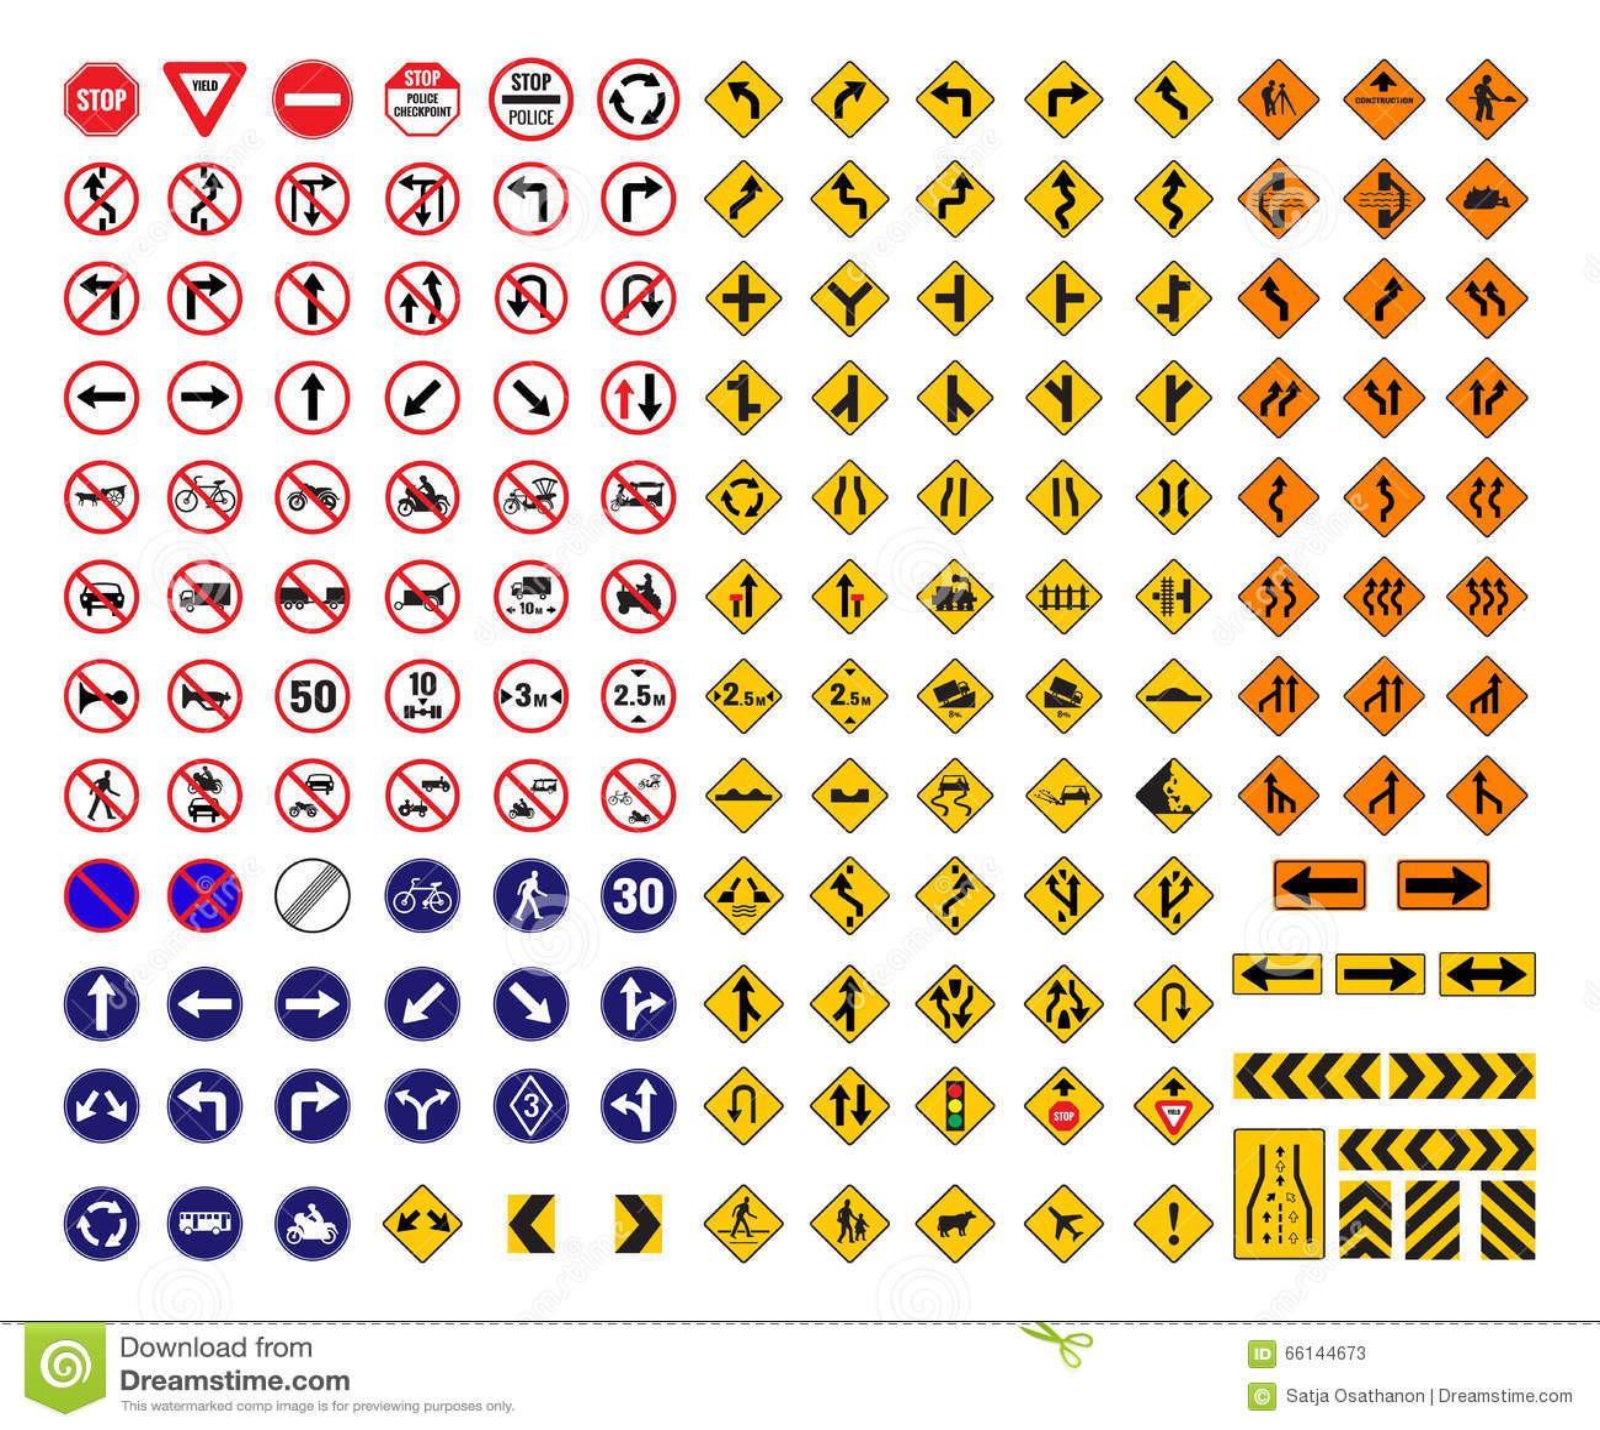 All Traffic Signs Stock Vector Illustration Of Signal